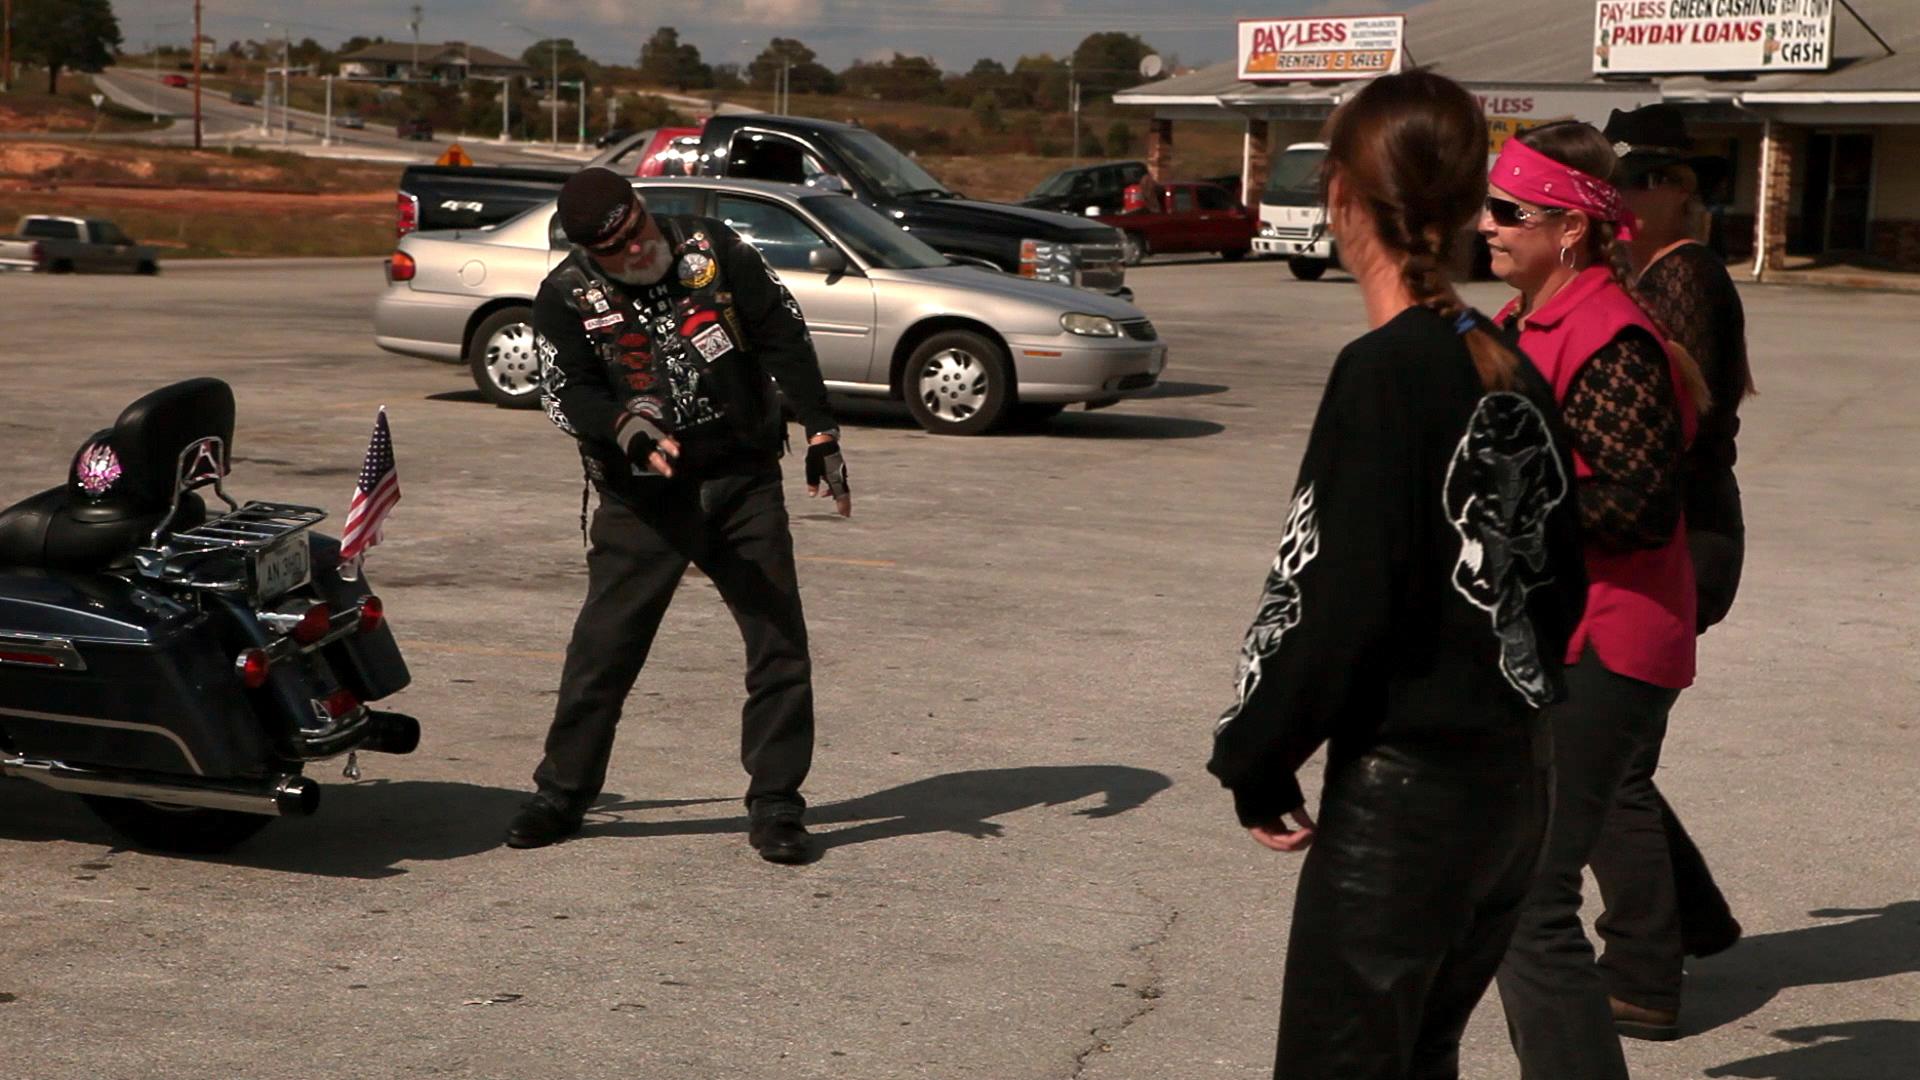 dancing in parking lot.jpg